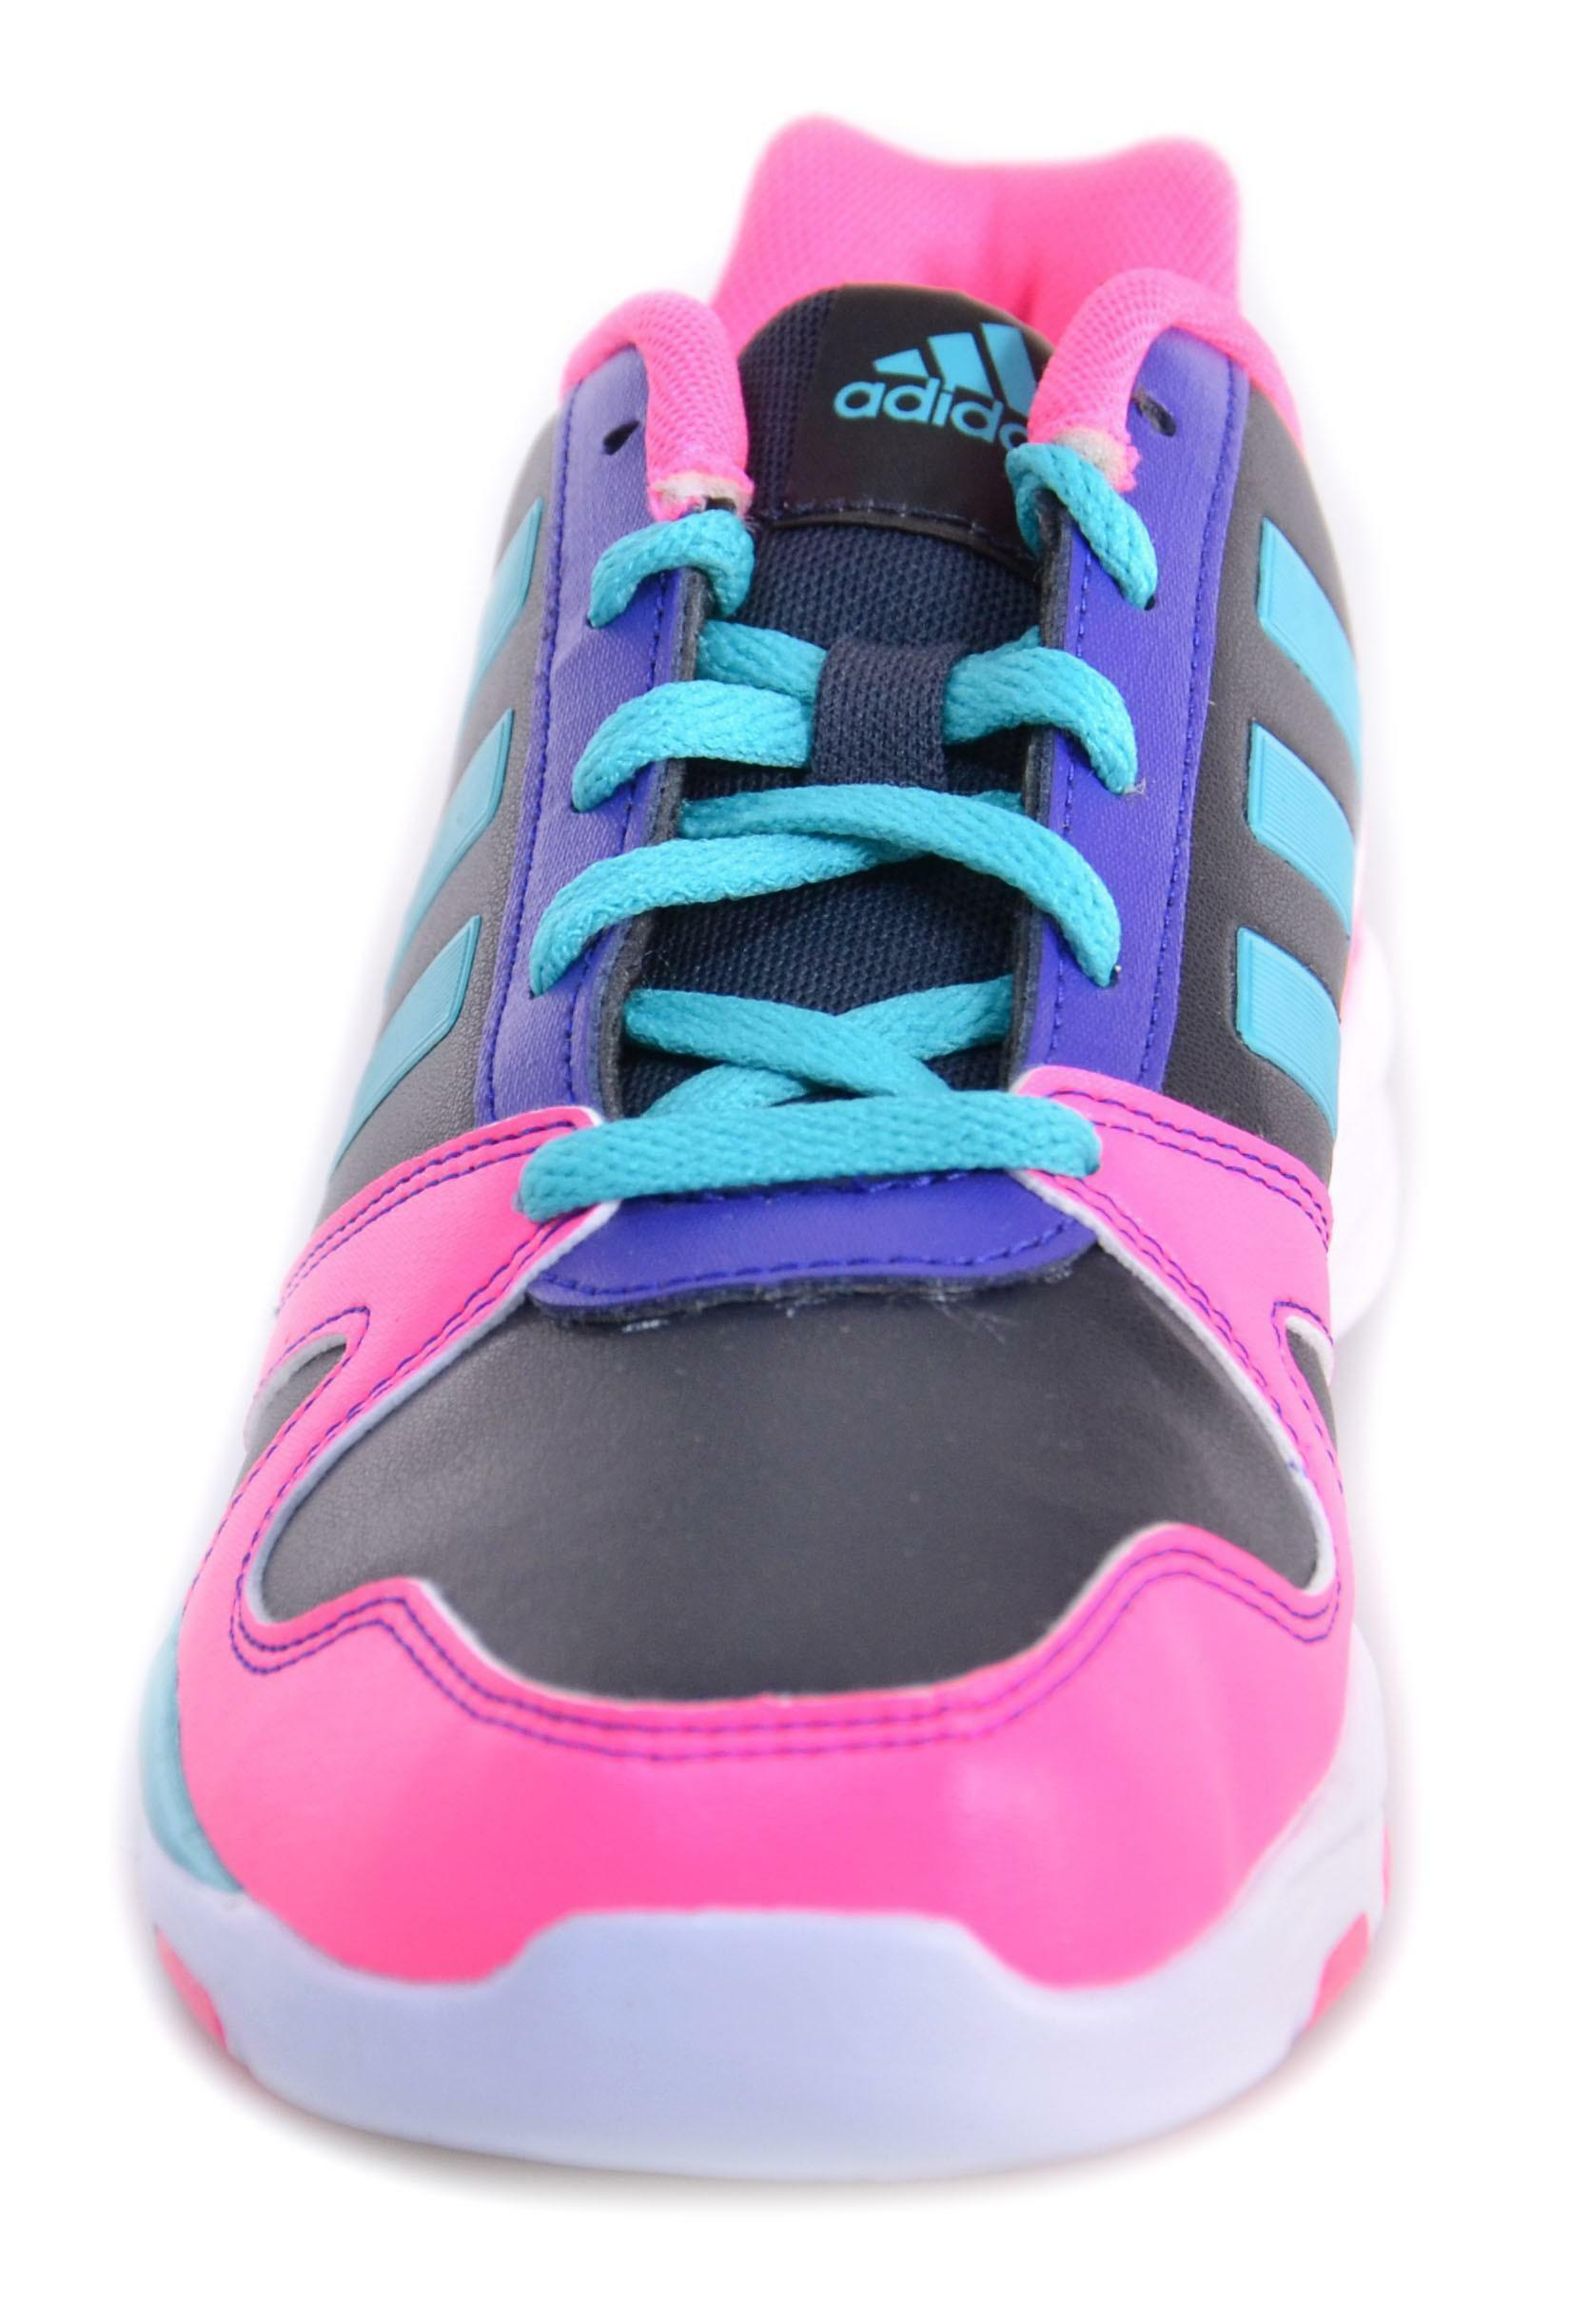 adidas adidas dance low k scarpe nere rosa pelle m20497